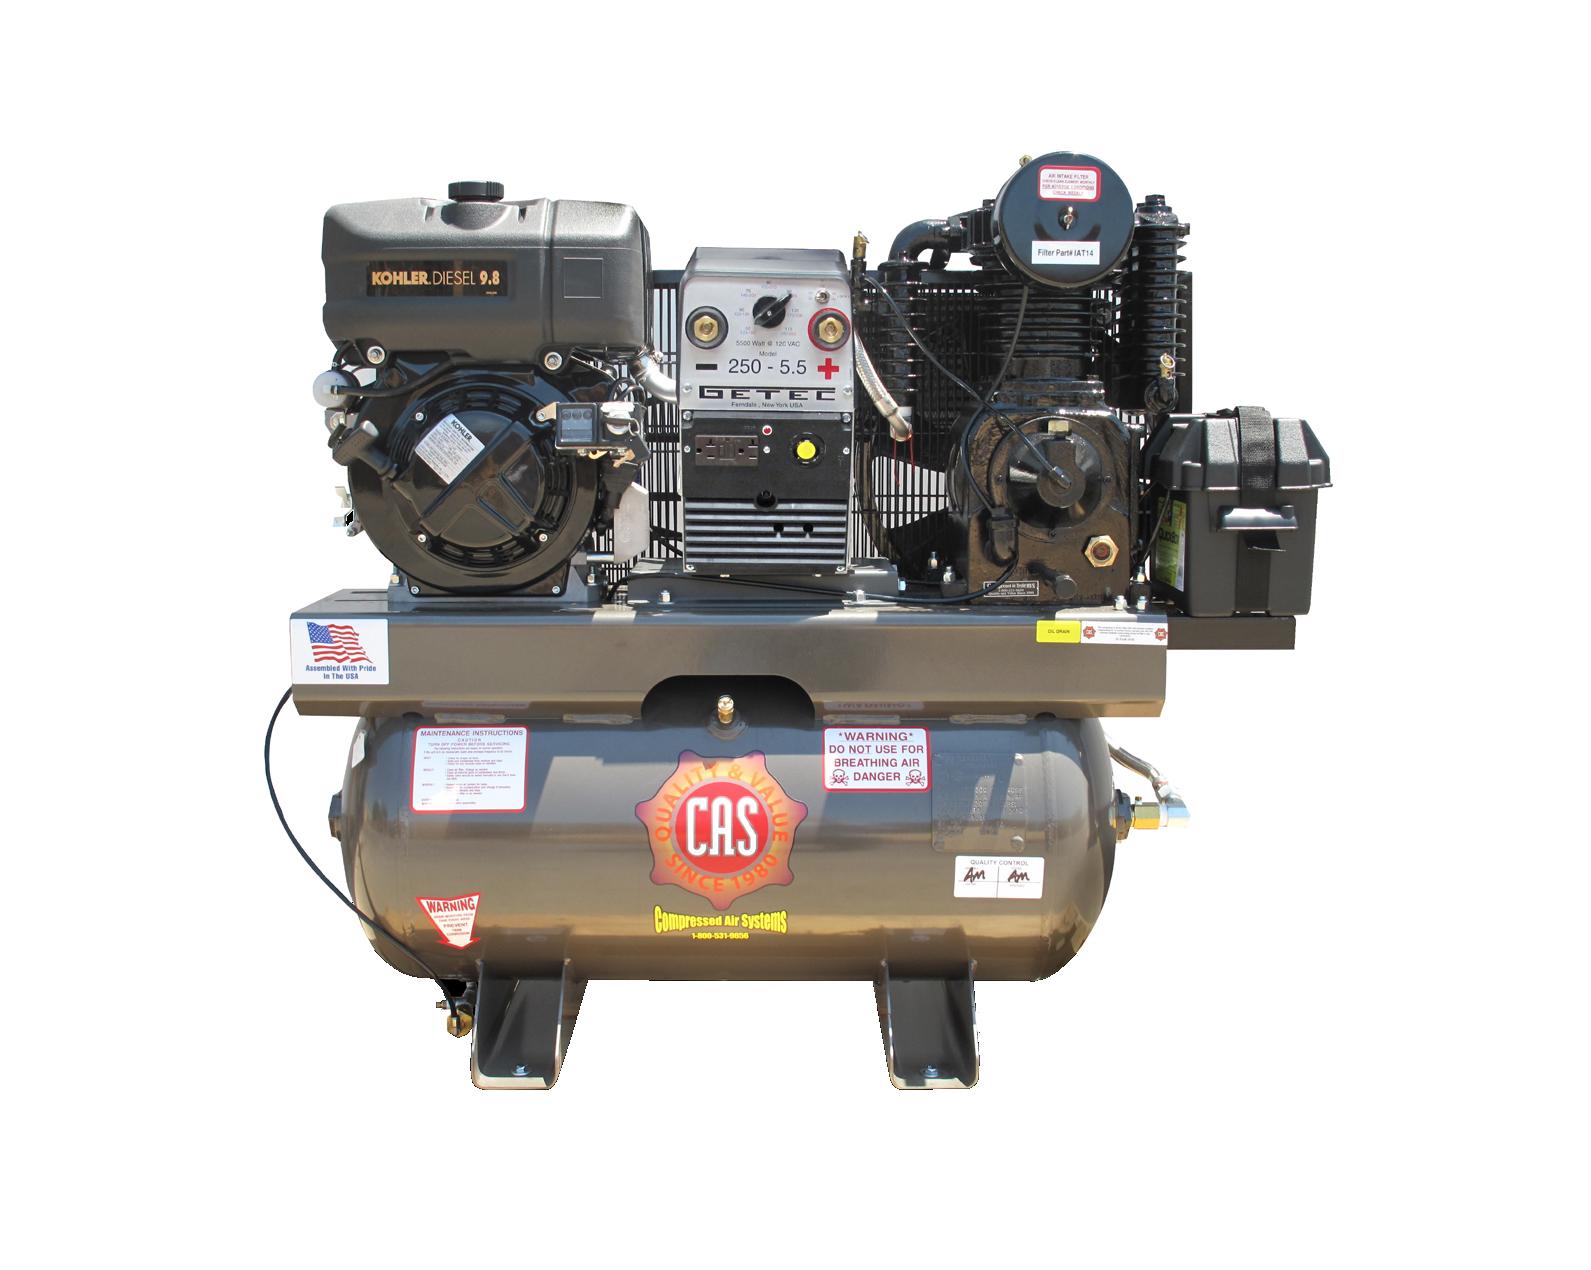 16 Cfm Diesel Engine Air Compressors With 5000 W Generator